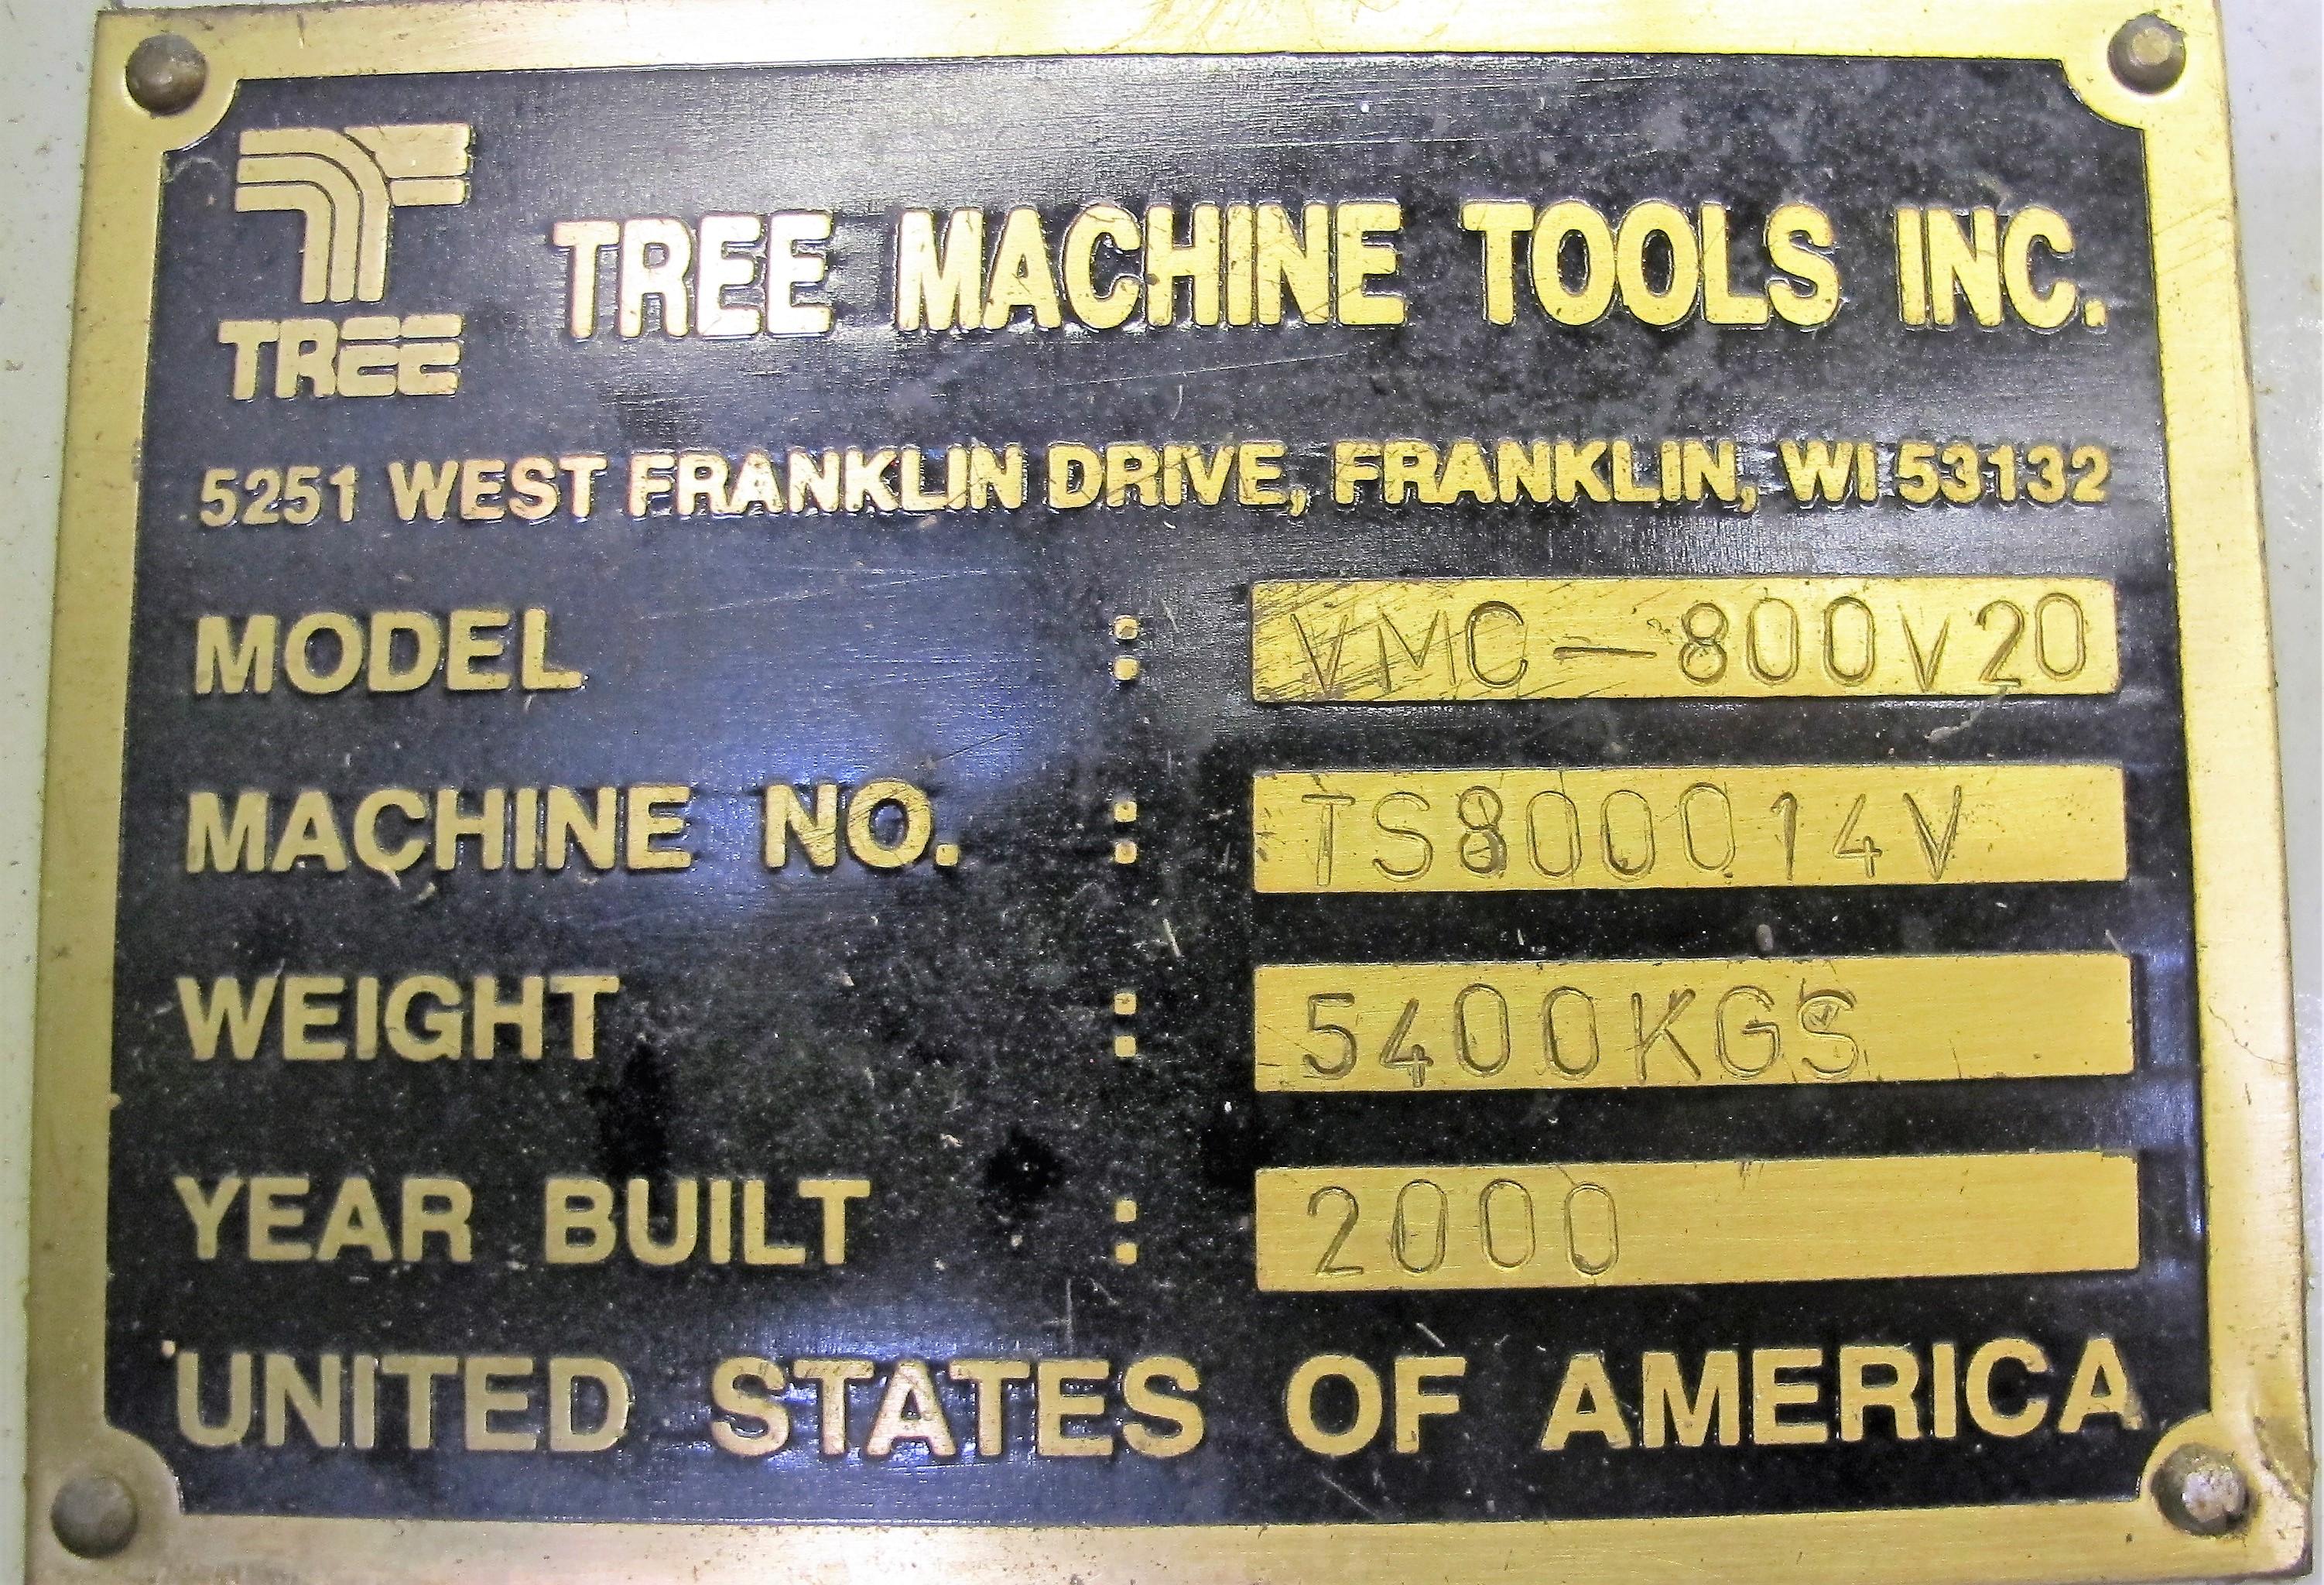 "TREEVMC 800/20 CNC VERTICAL MACHINING CENTER, S/N TS80900014U, PC-2100 CNC CONTROL, ATC, 25"" x - Image 12 of 16"